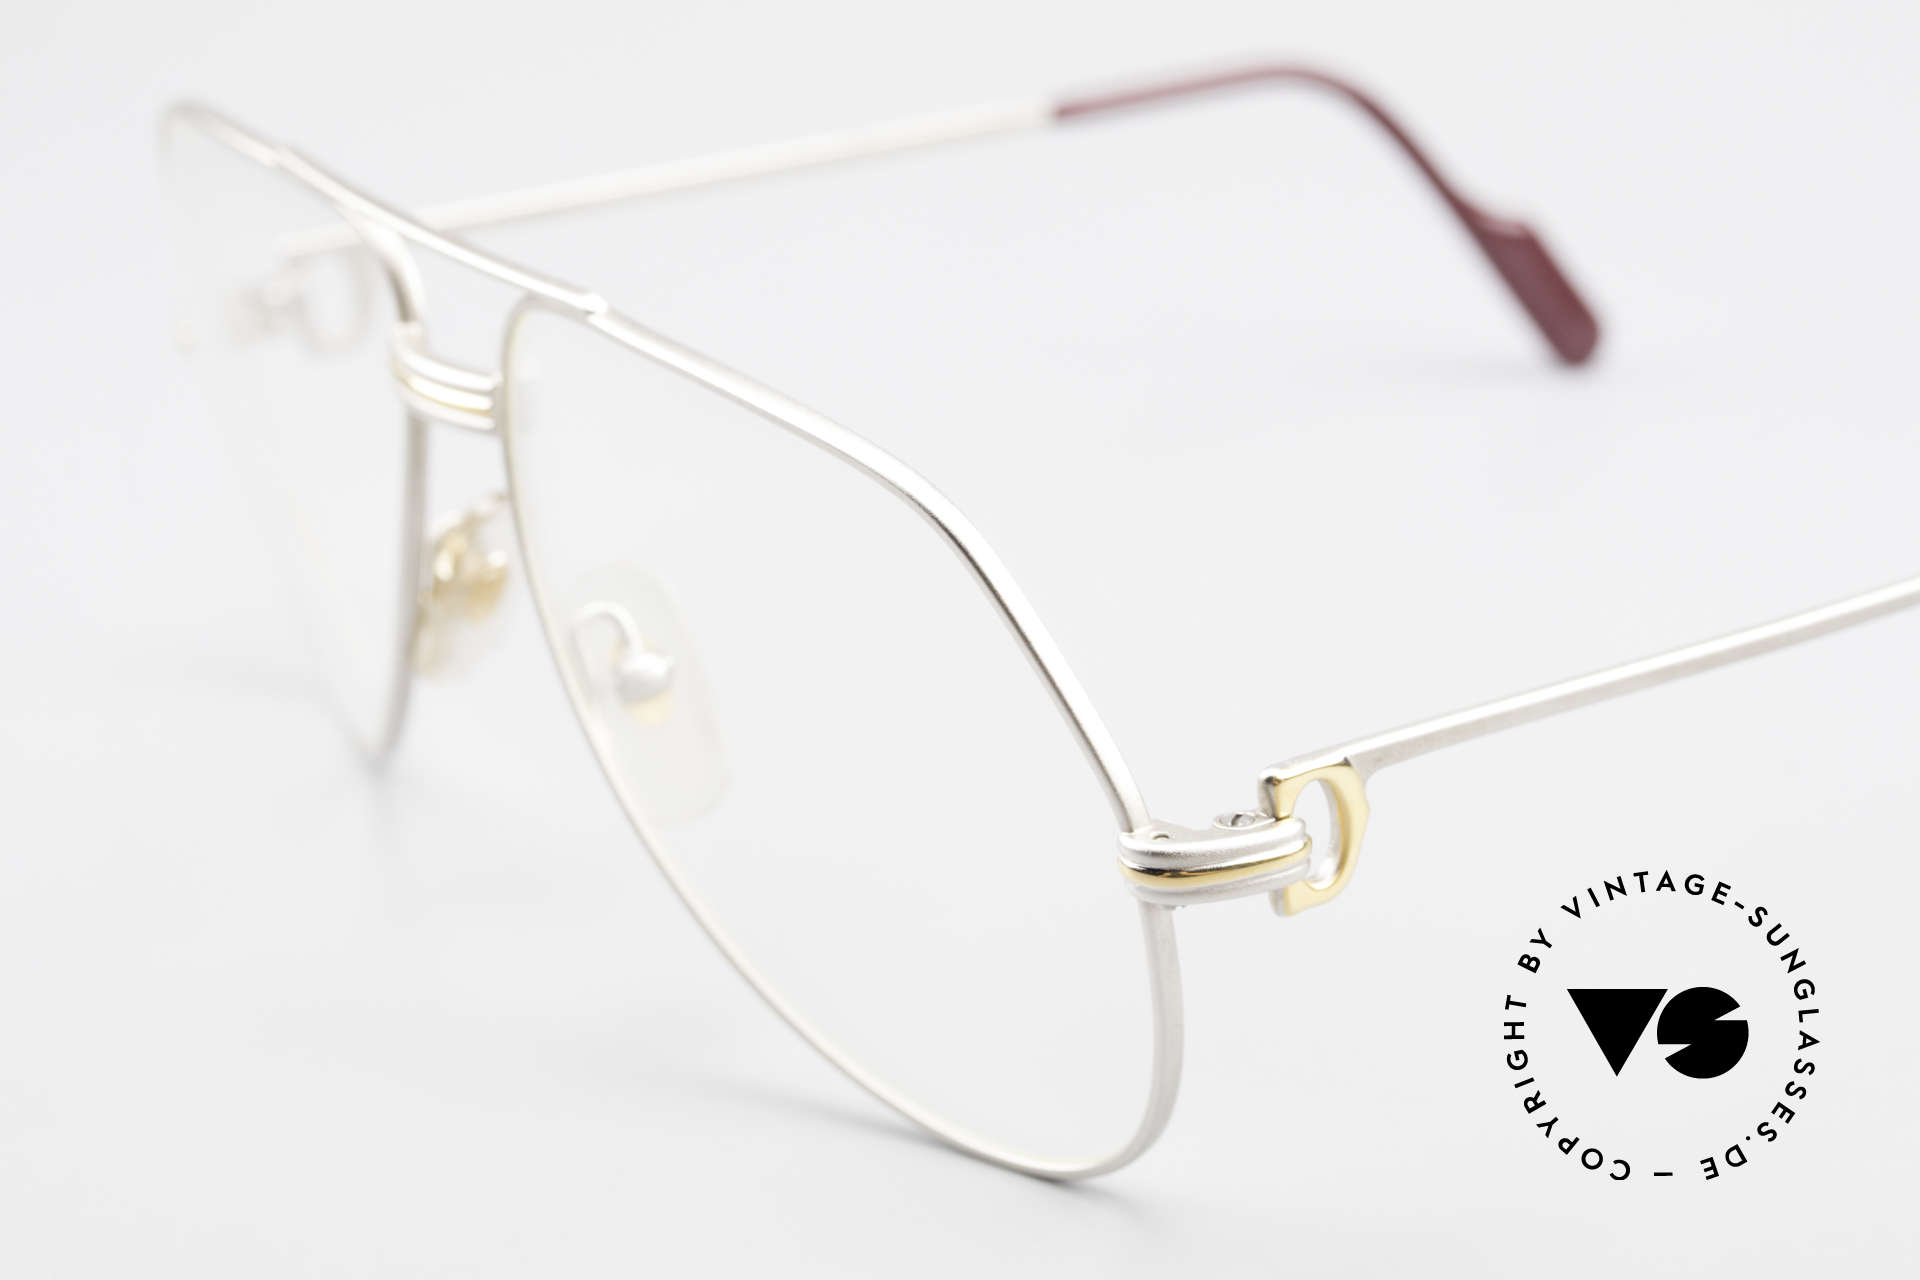 Cartier Vendome LC - M Precious Palladium Finish, rare & expensive edition with palladium finish; LUXURY!, Made for Men